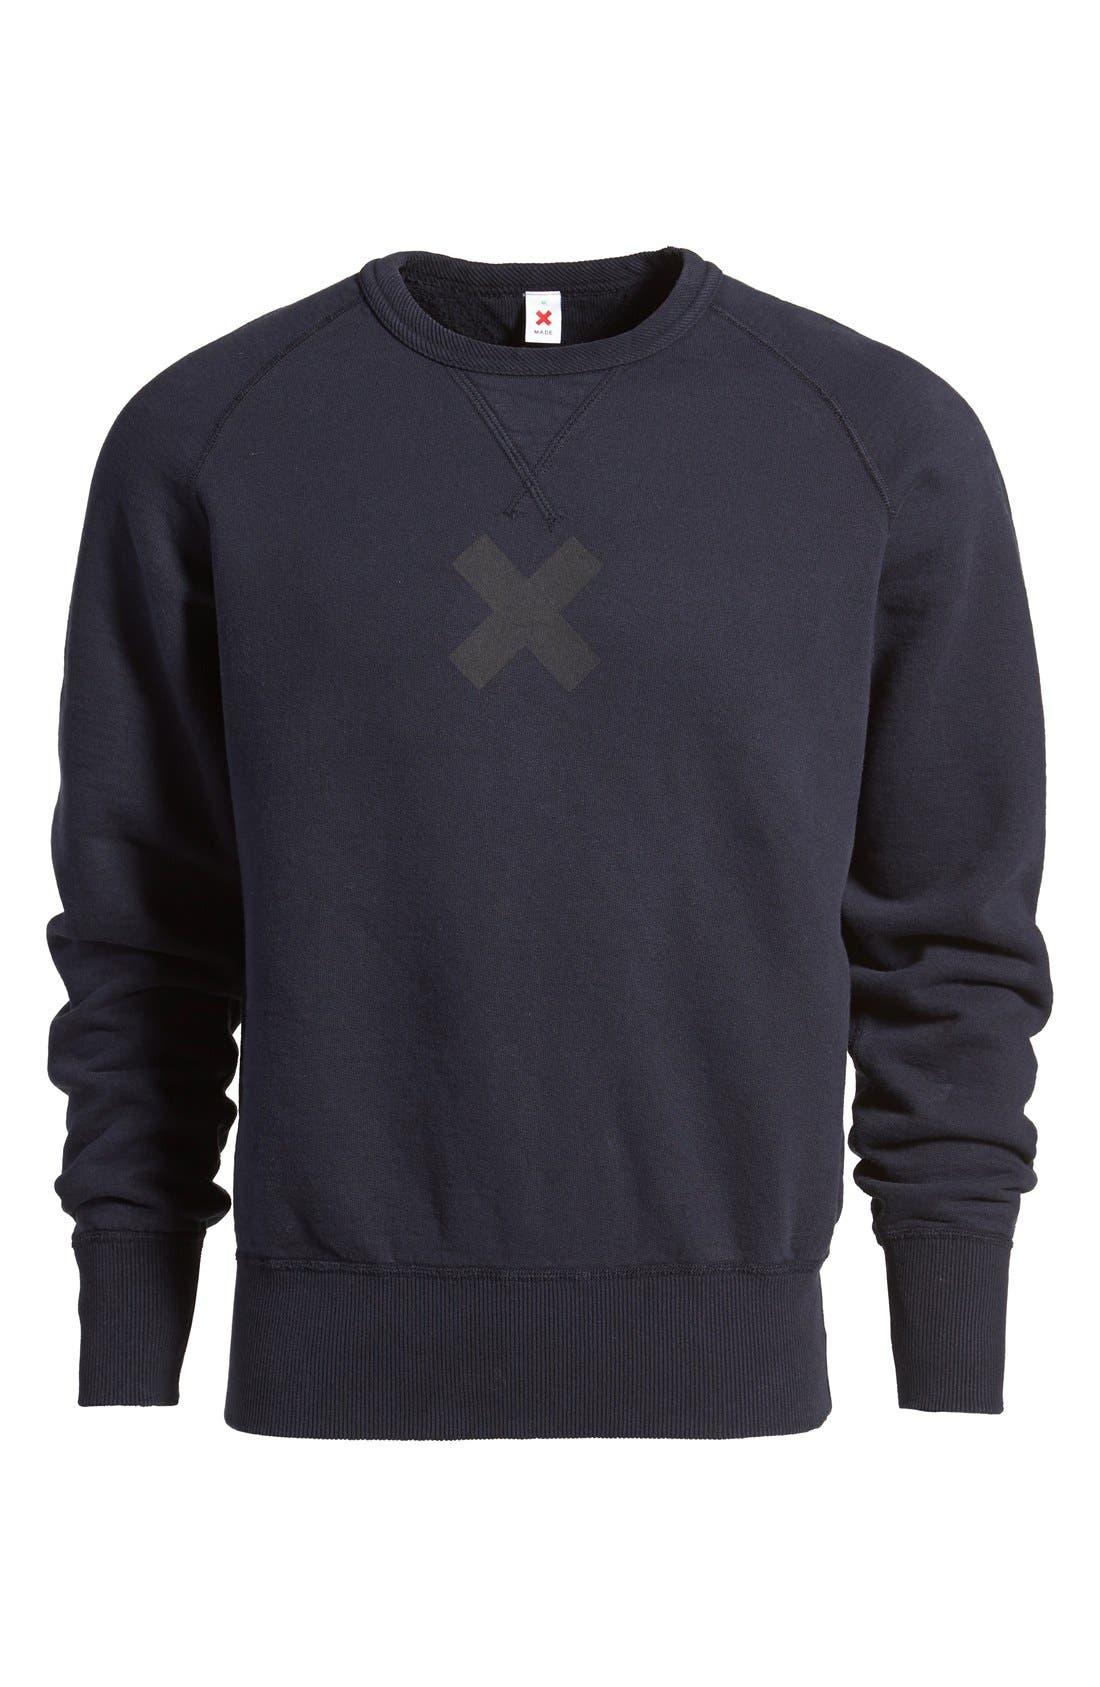 BEST MADE CO.,                             Best Made Co '20 oz. Standard' Sweatshirt,                             Alternate thumbnail 2, color,                             400